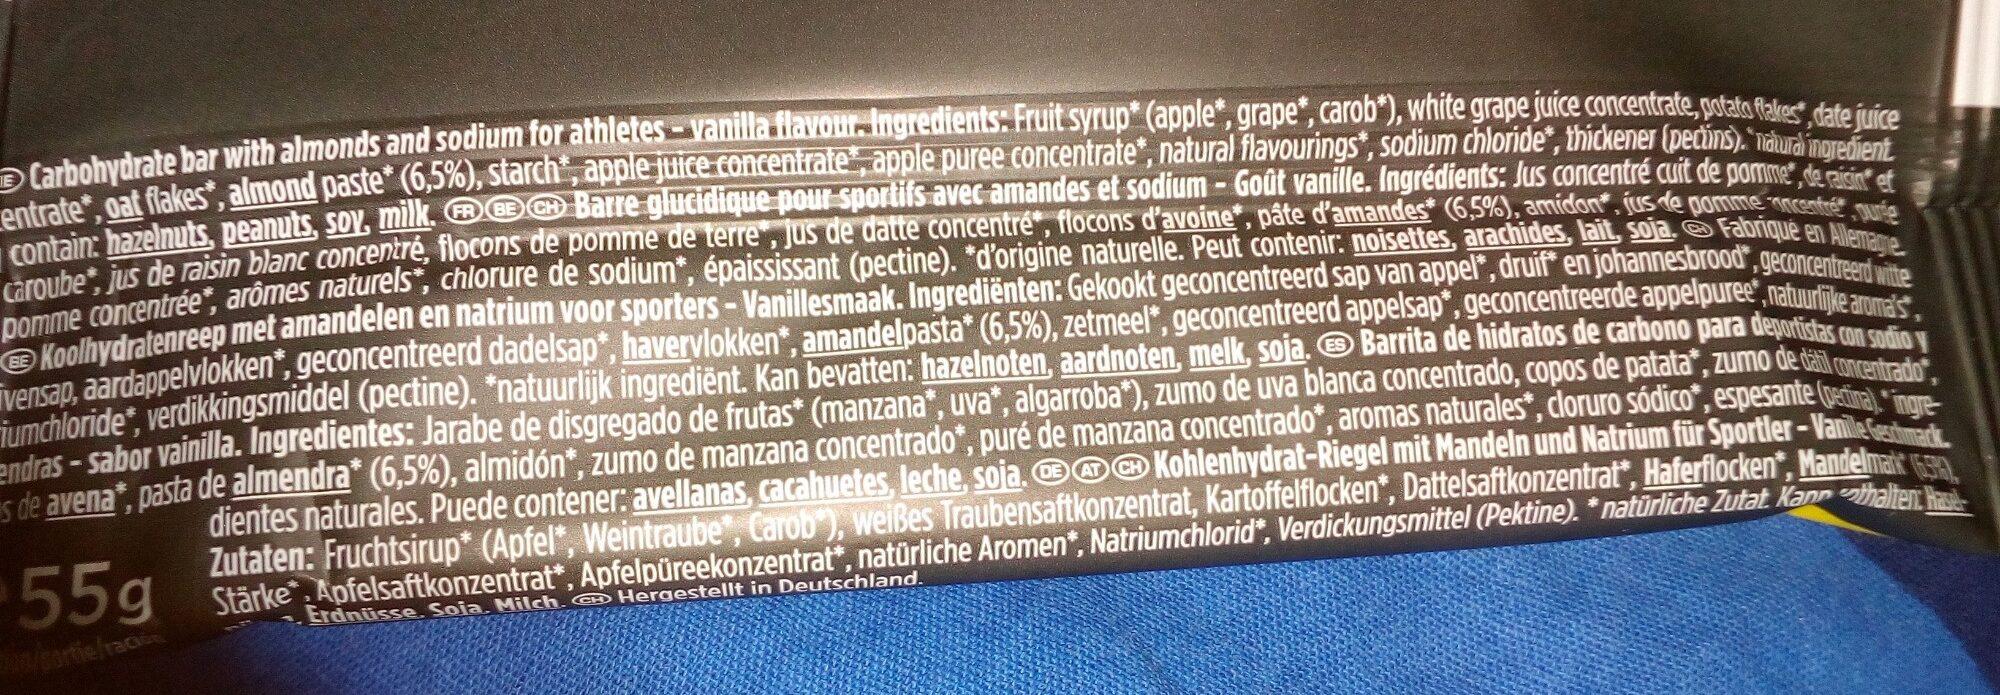 energize almond vanilla - Ingredients - fr